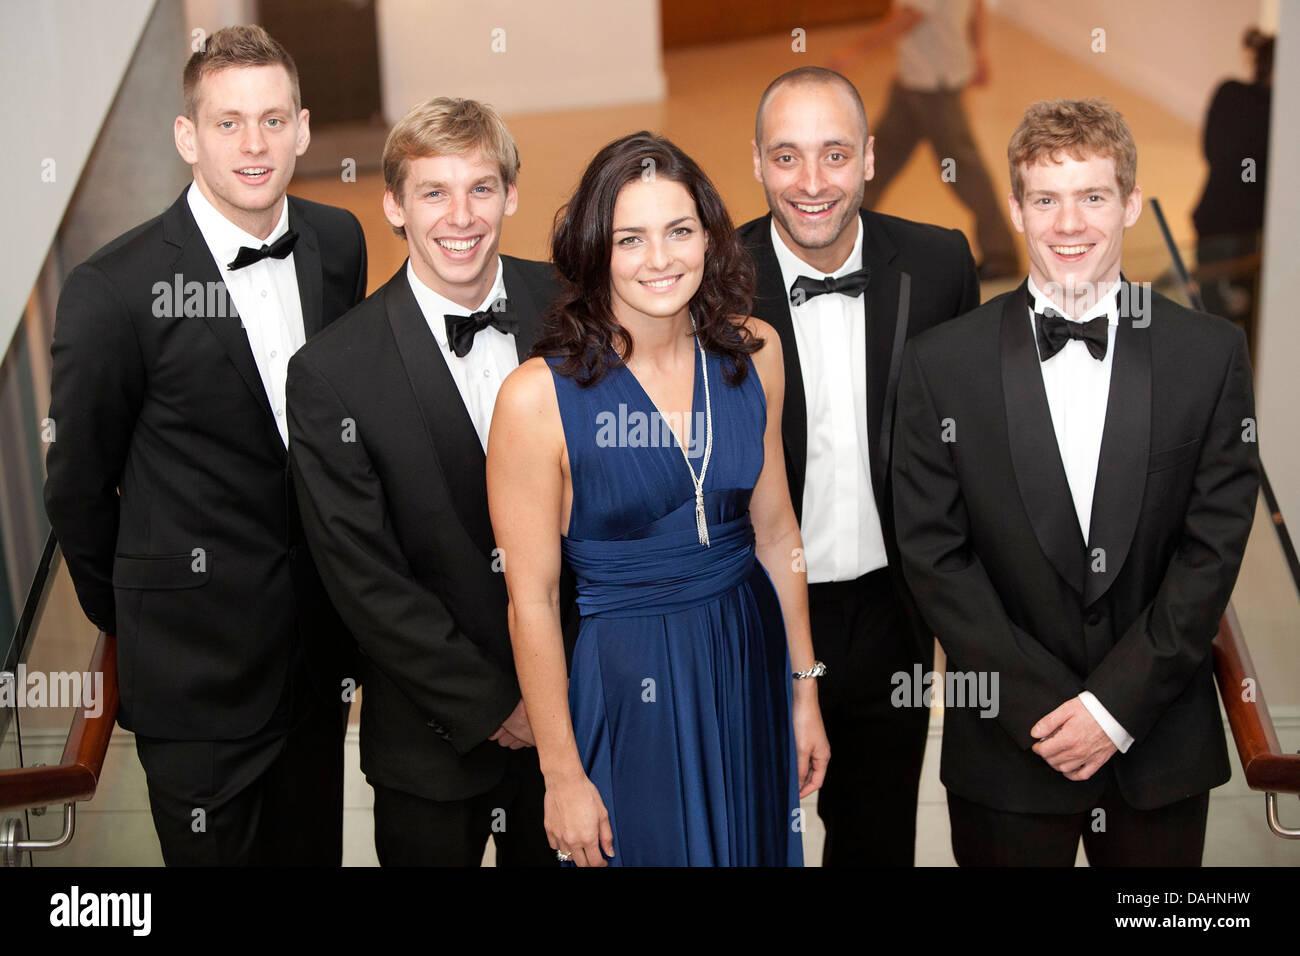 L-R Dan Sliwinski , David Carry , Keri-Anne Payne , James Goddard and Michael Rock - Stock Image